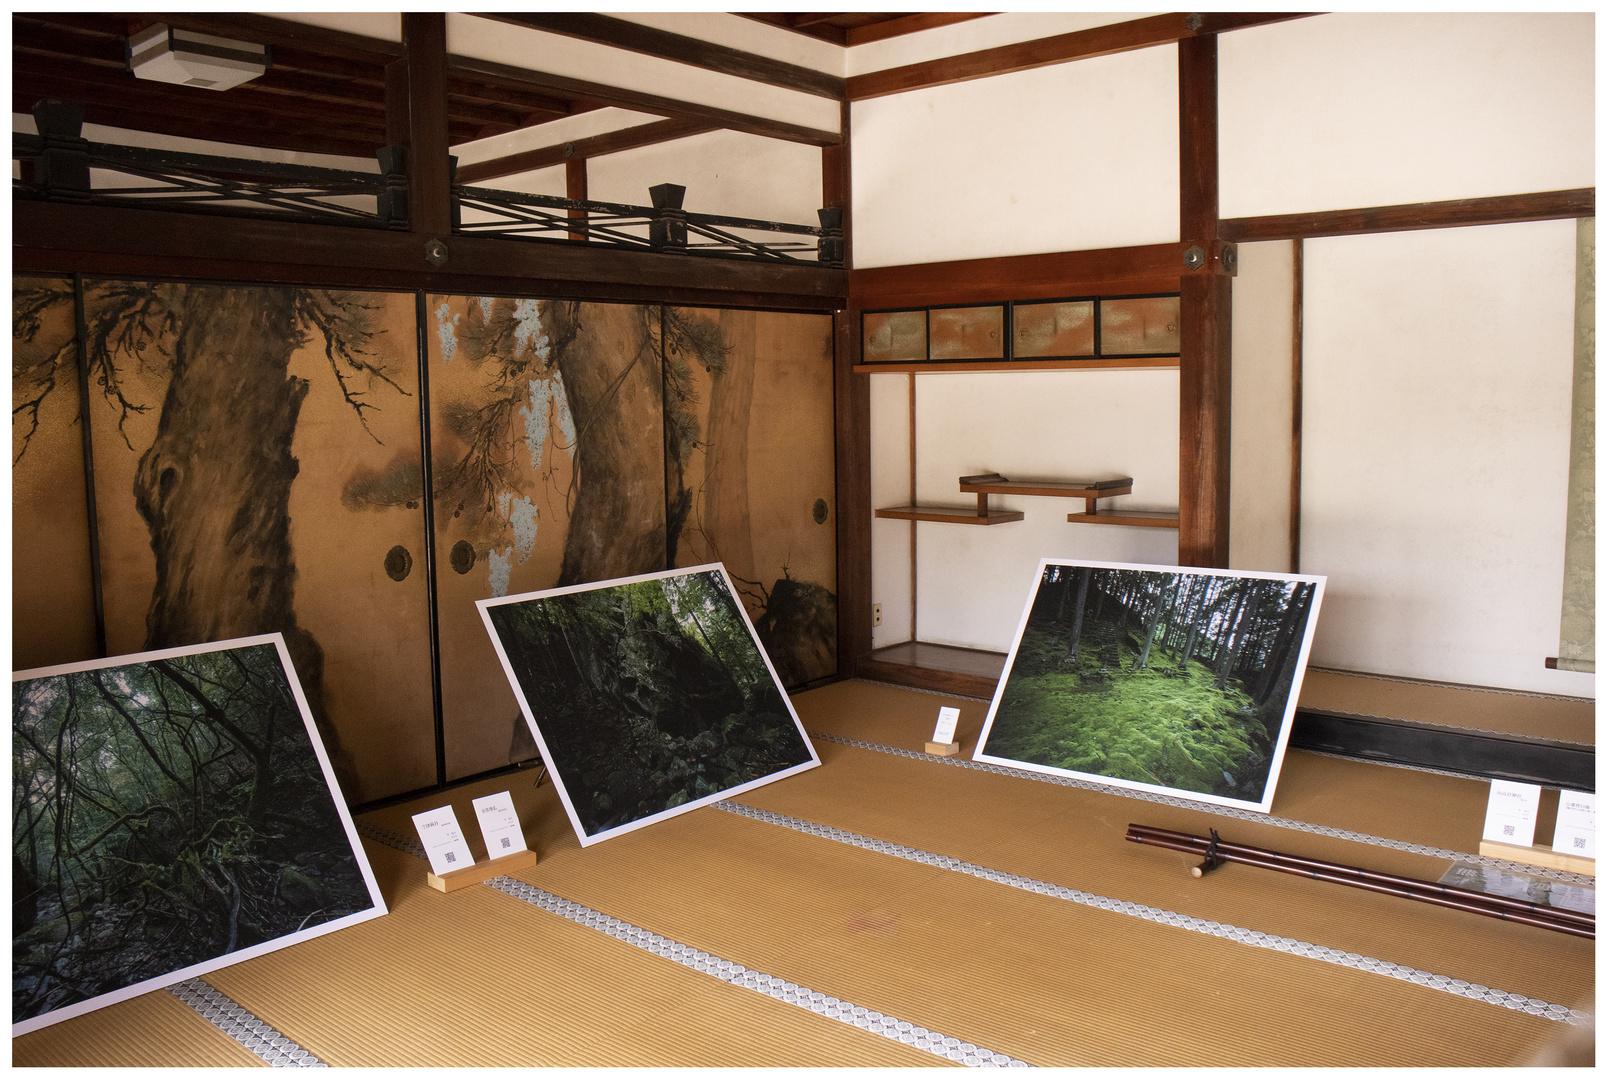 At Ninnaji Temple in Kyoto 4